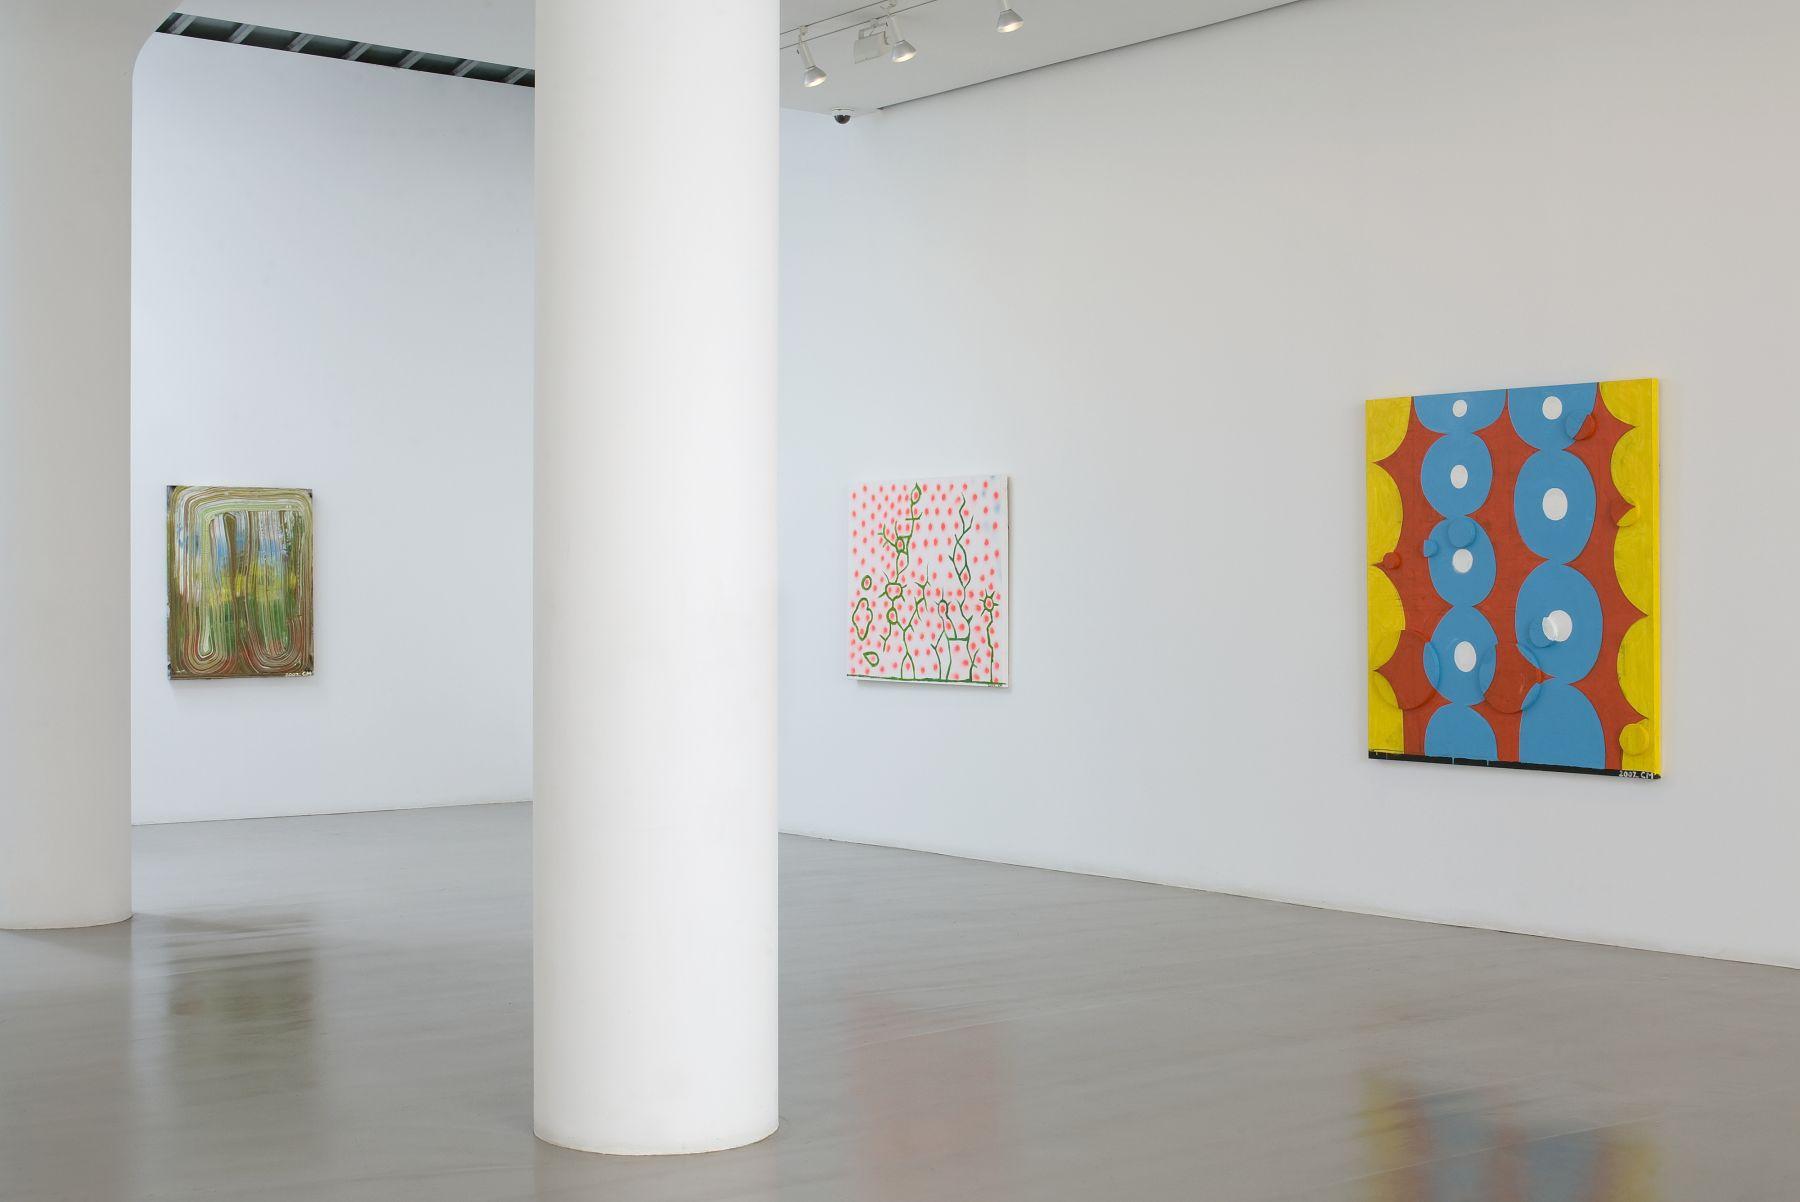 CHRIS MARTIN Installation view at Mitchell-Innes & Nash, NY, 2008